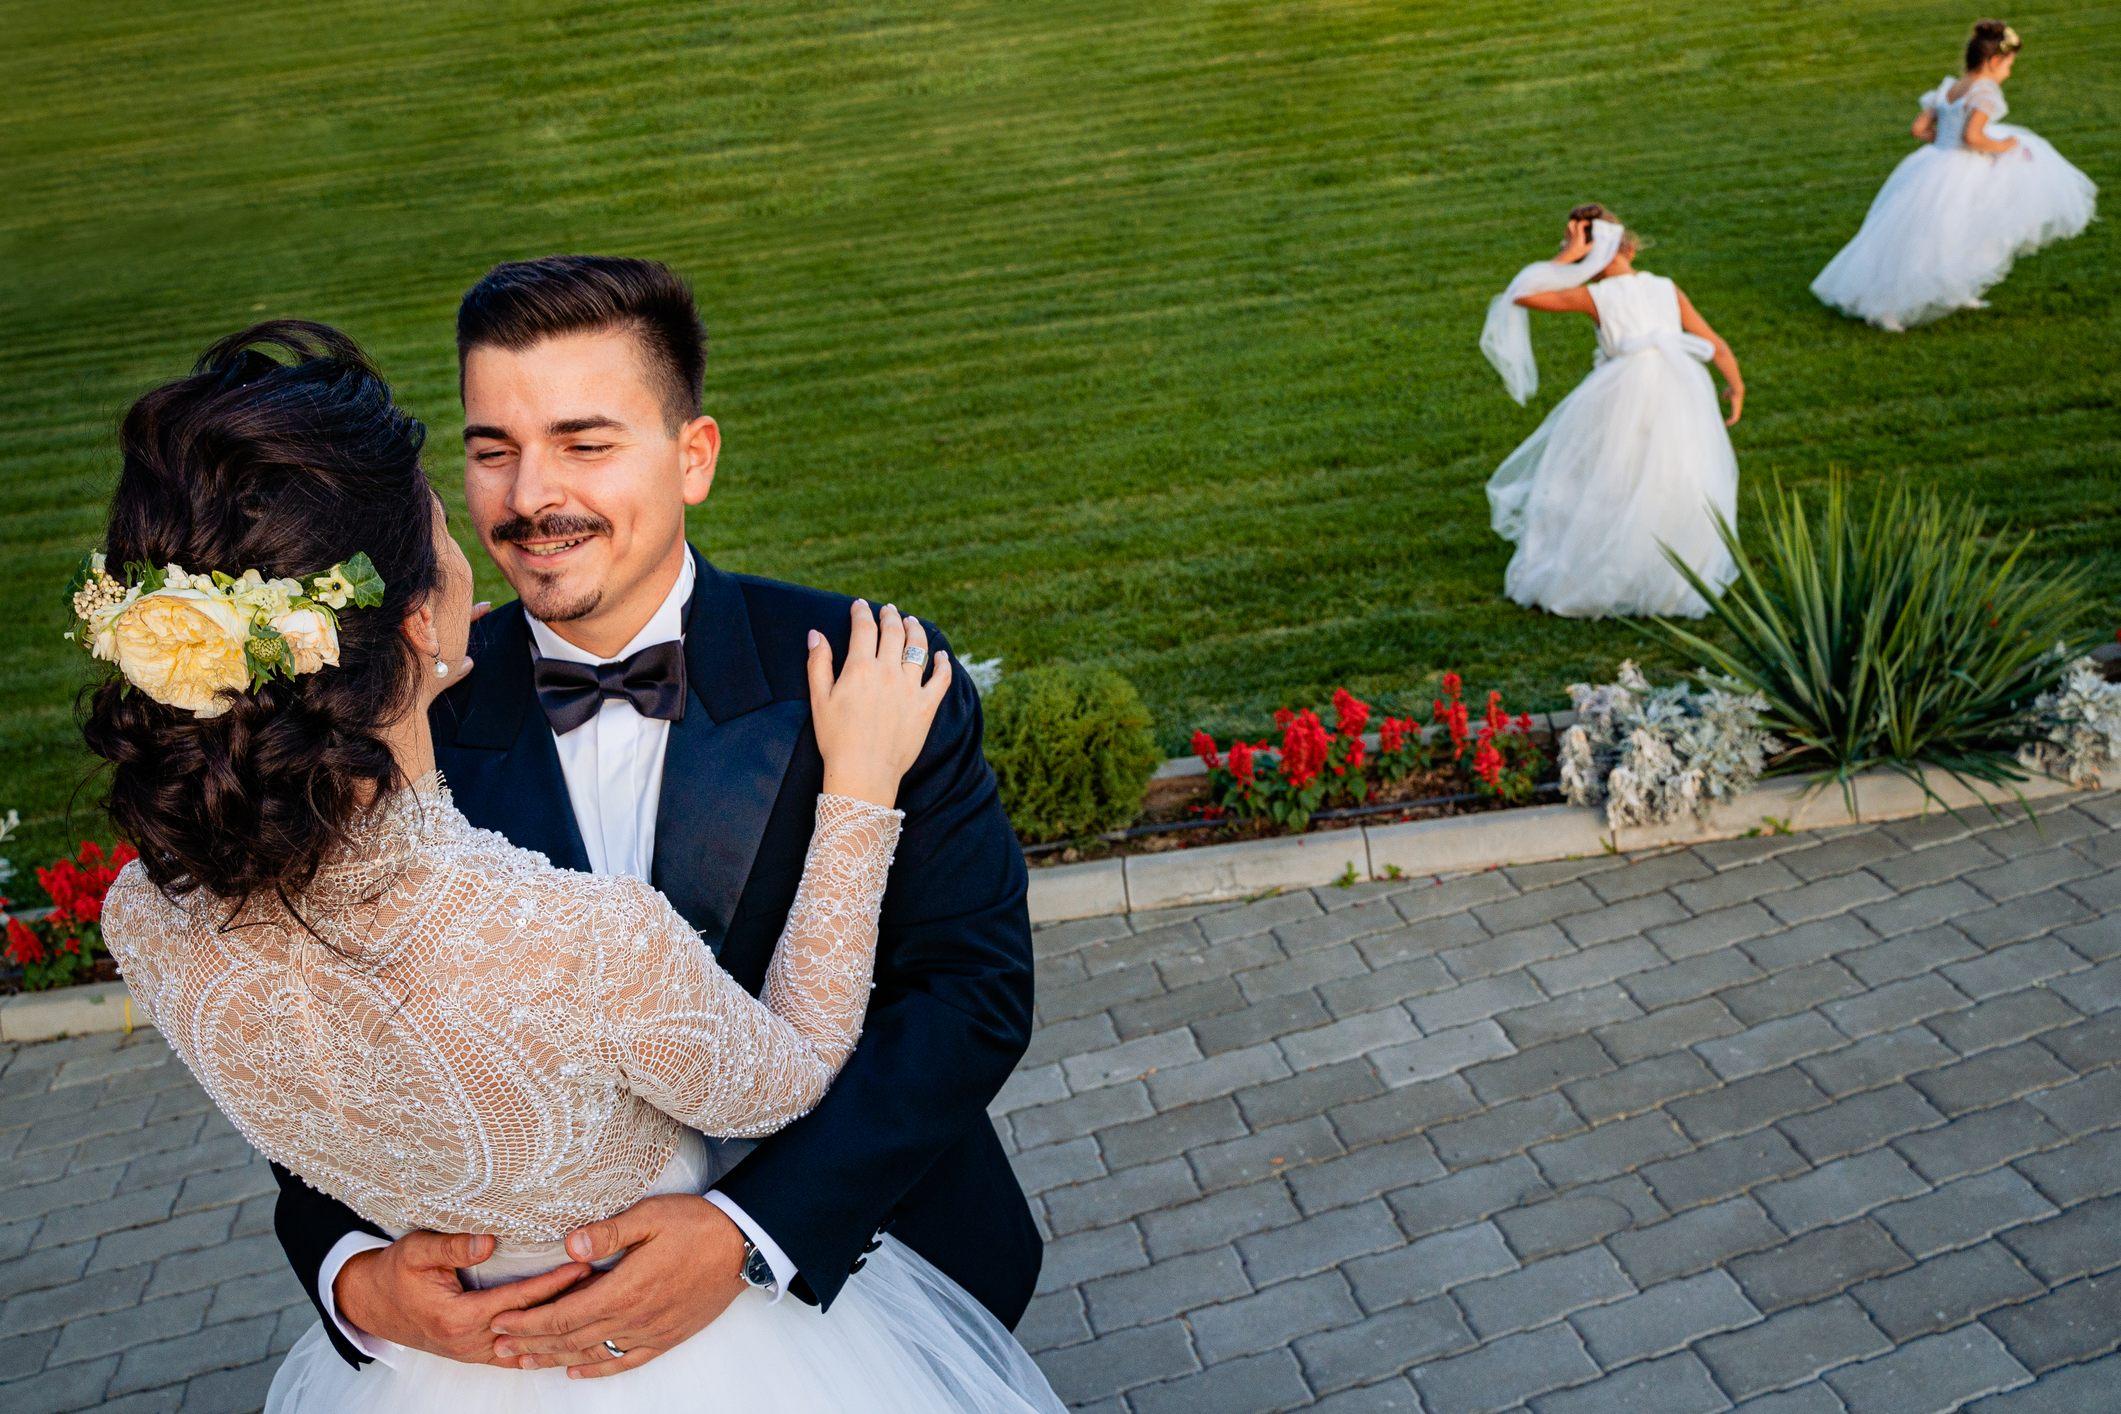 fotograf nunta bucuresti laurentiu nica  21 - Lorena & Matei | Fotografii nunta Bucuresti | Restaurant Domeniul cu Ciresi